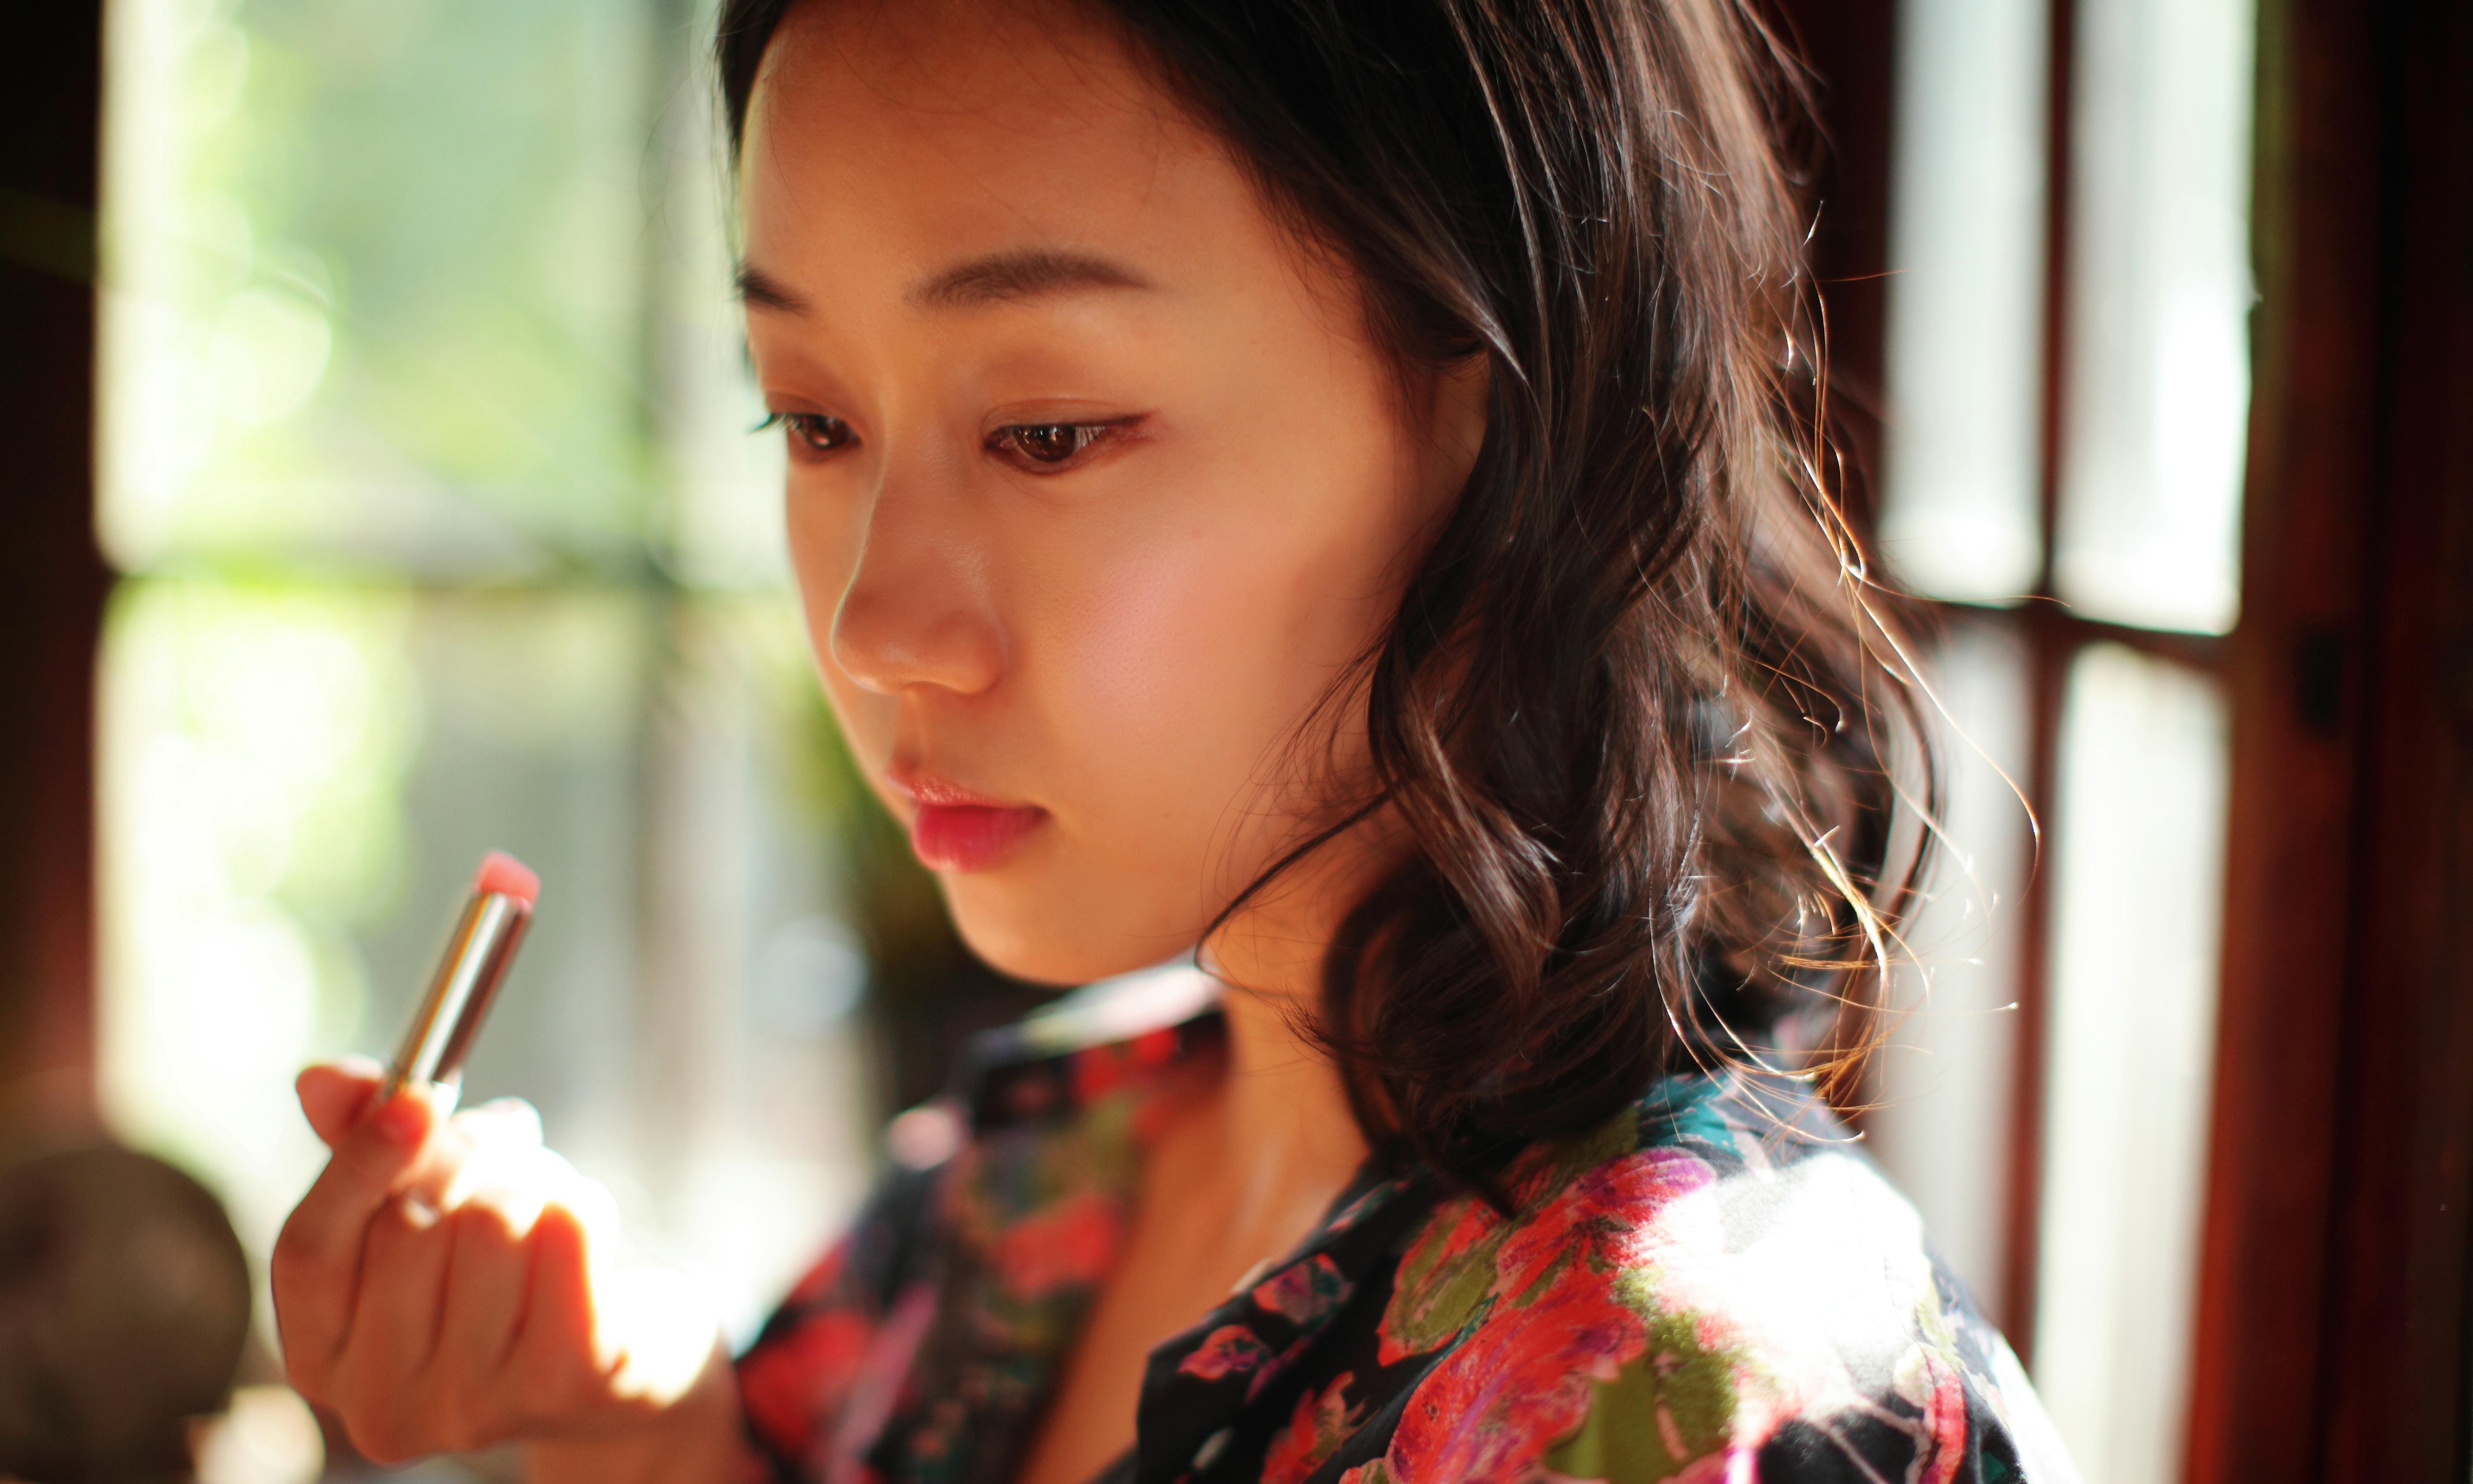 'Escape the corset': South Korean women rebel against strict beauty standards